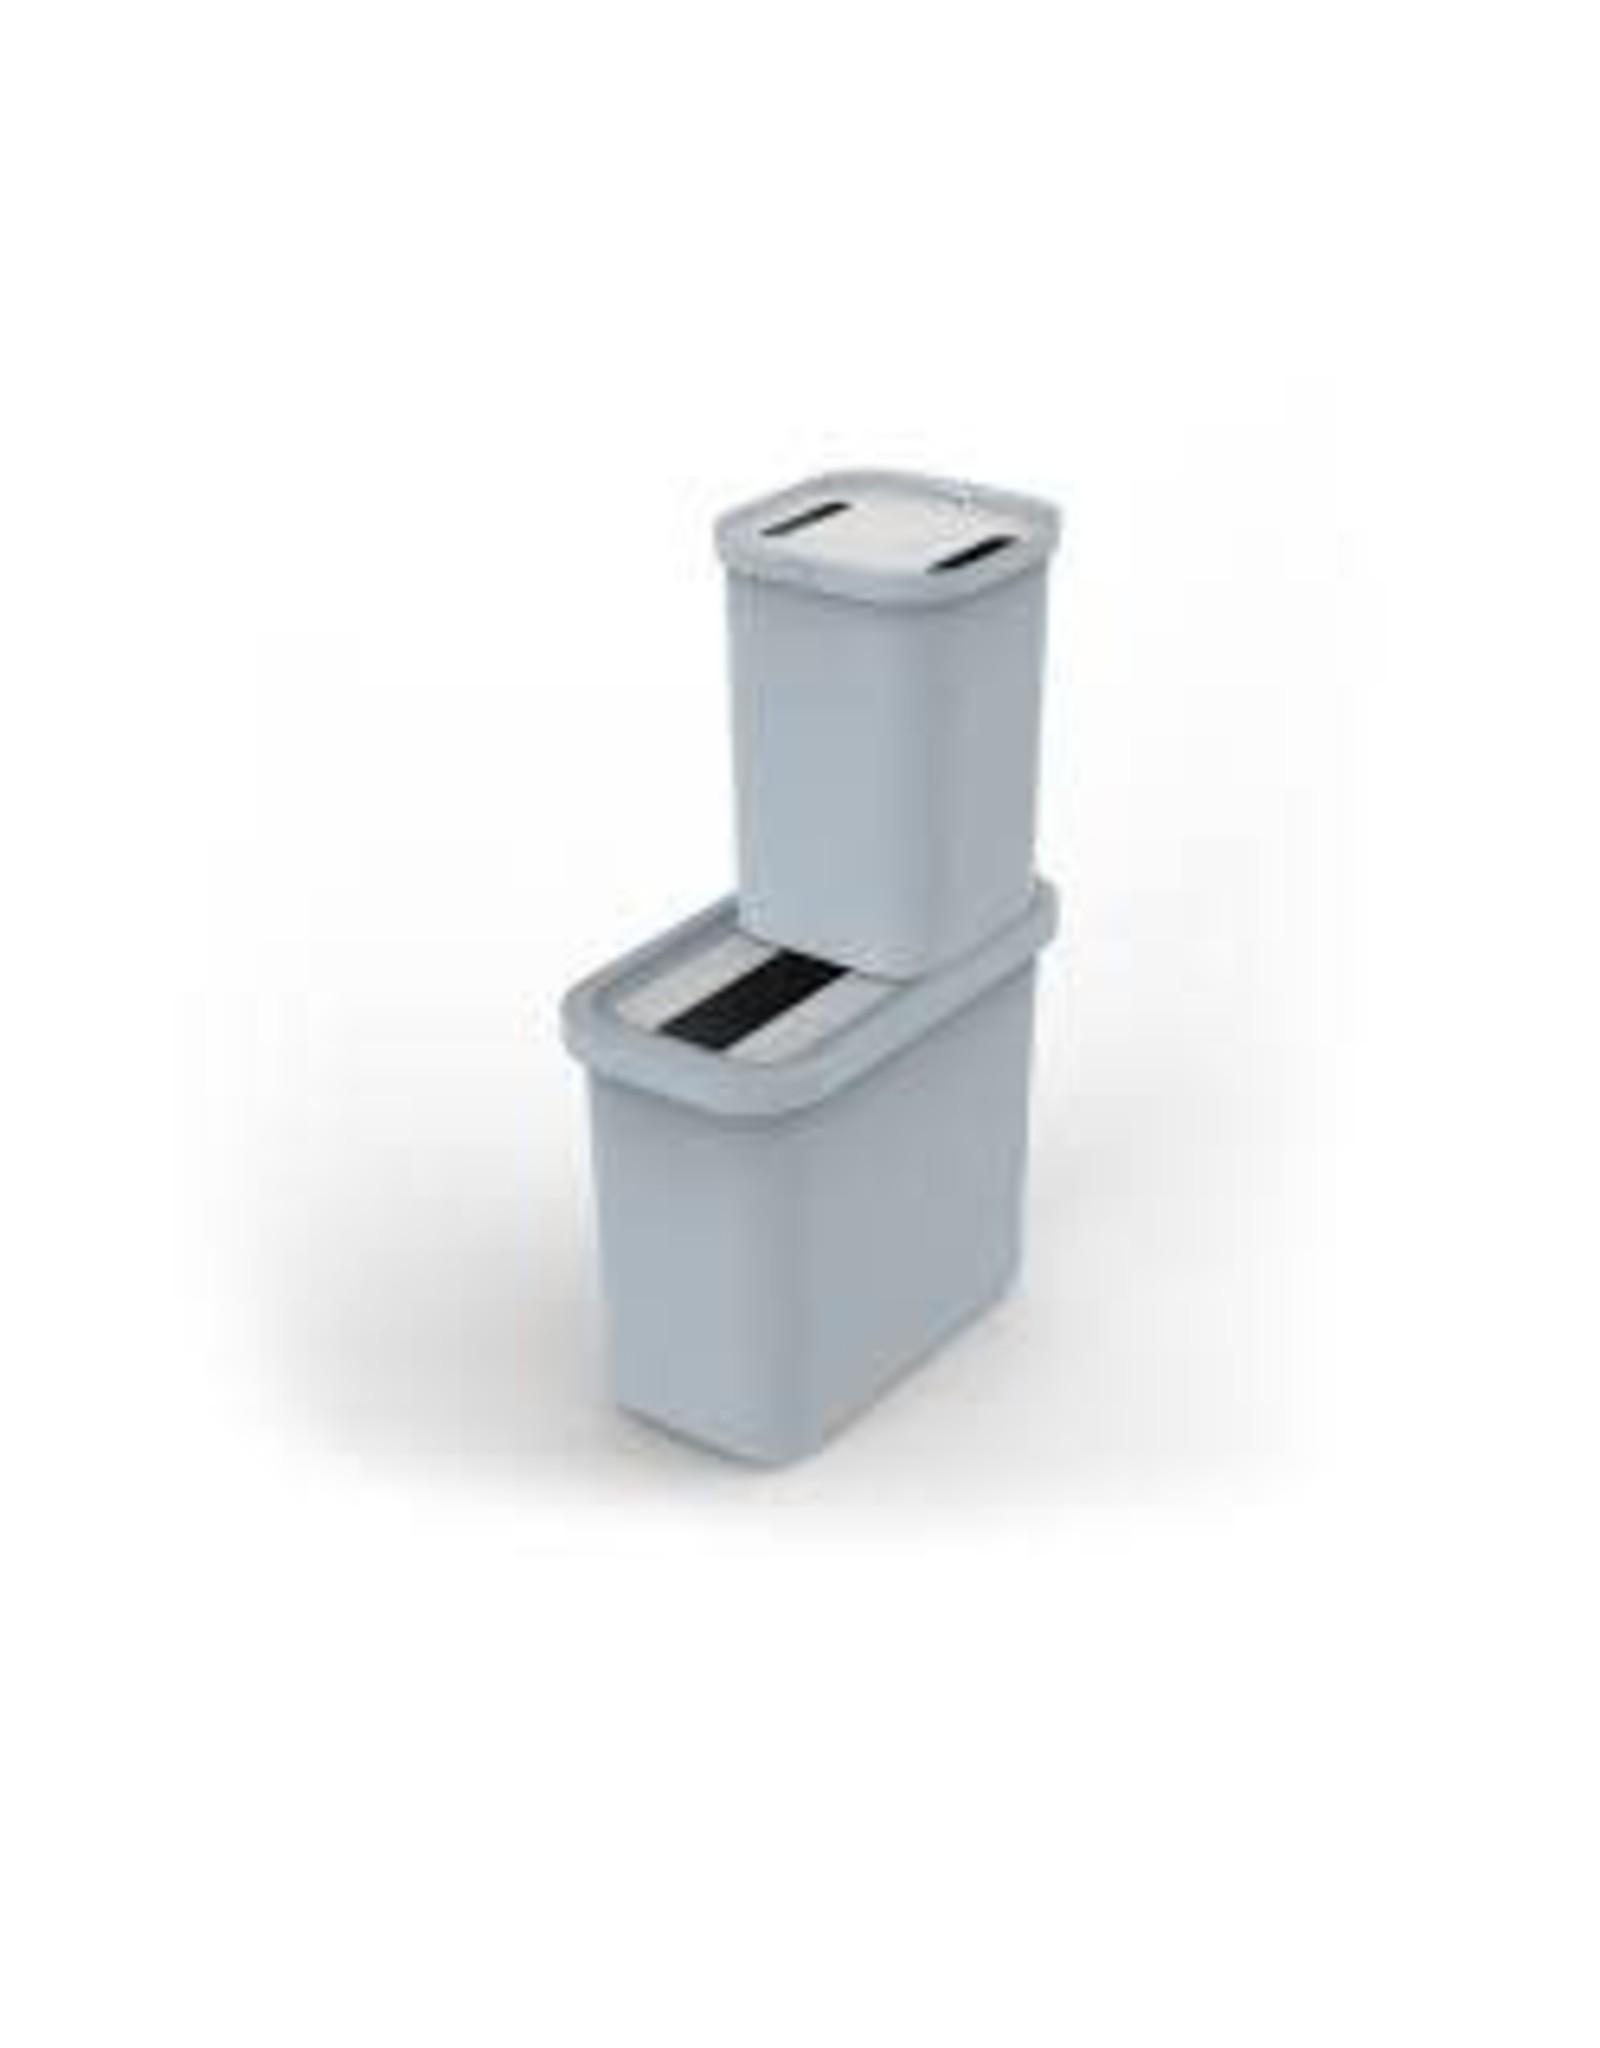 Joseph & Joseph J&J GoRecycle 46-Litre Recycling Collector & Caddy Set